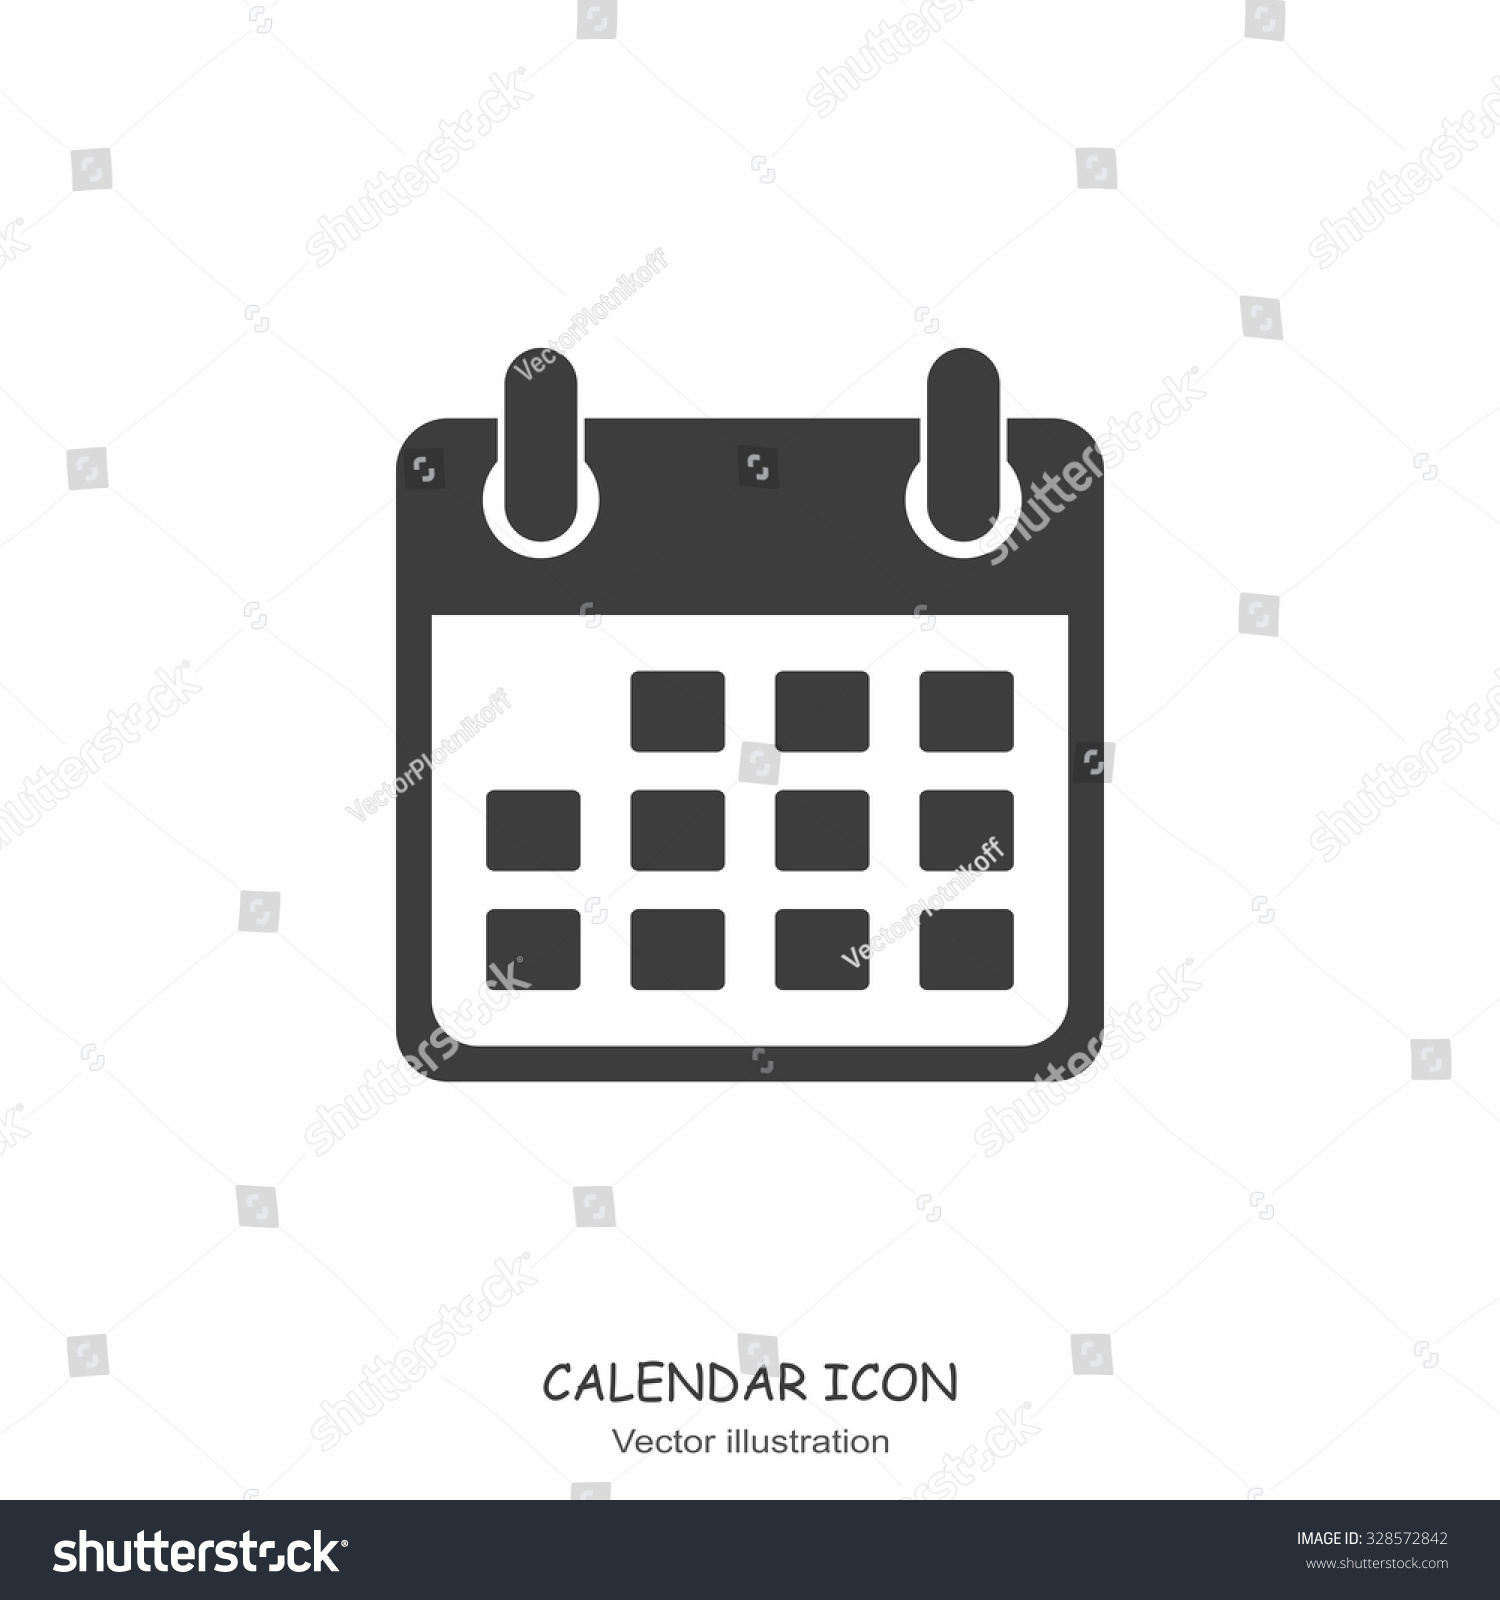 Calendar Flat Illustration : Calendar icon flat design style vector stock